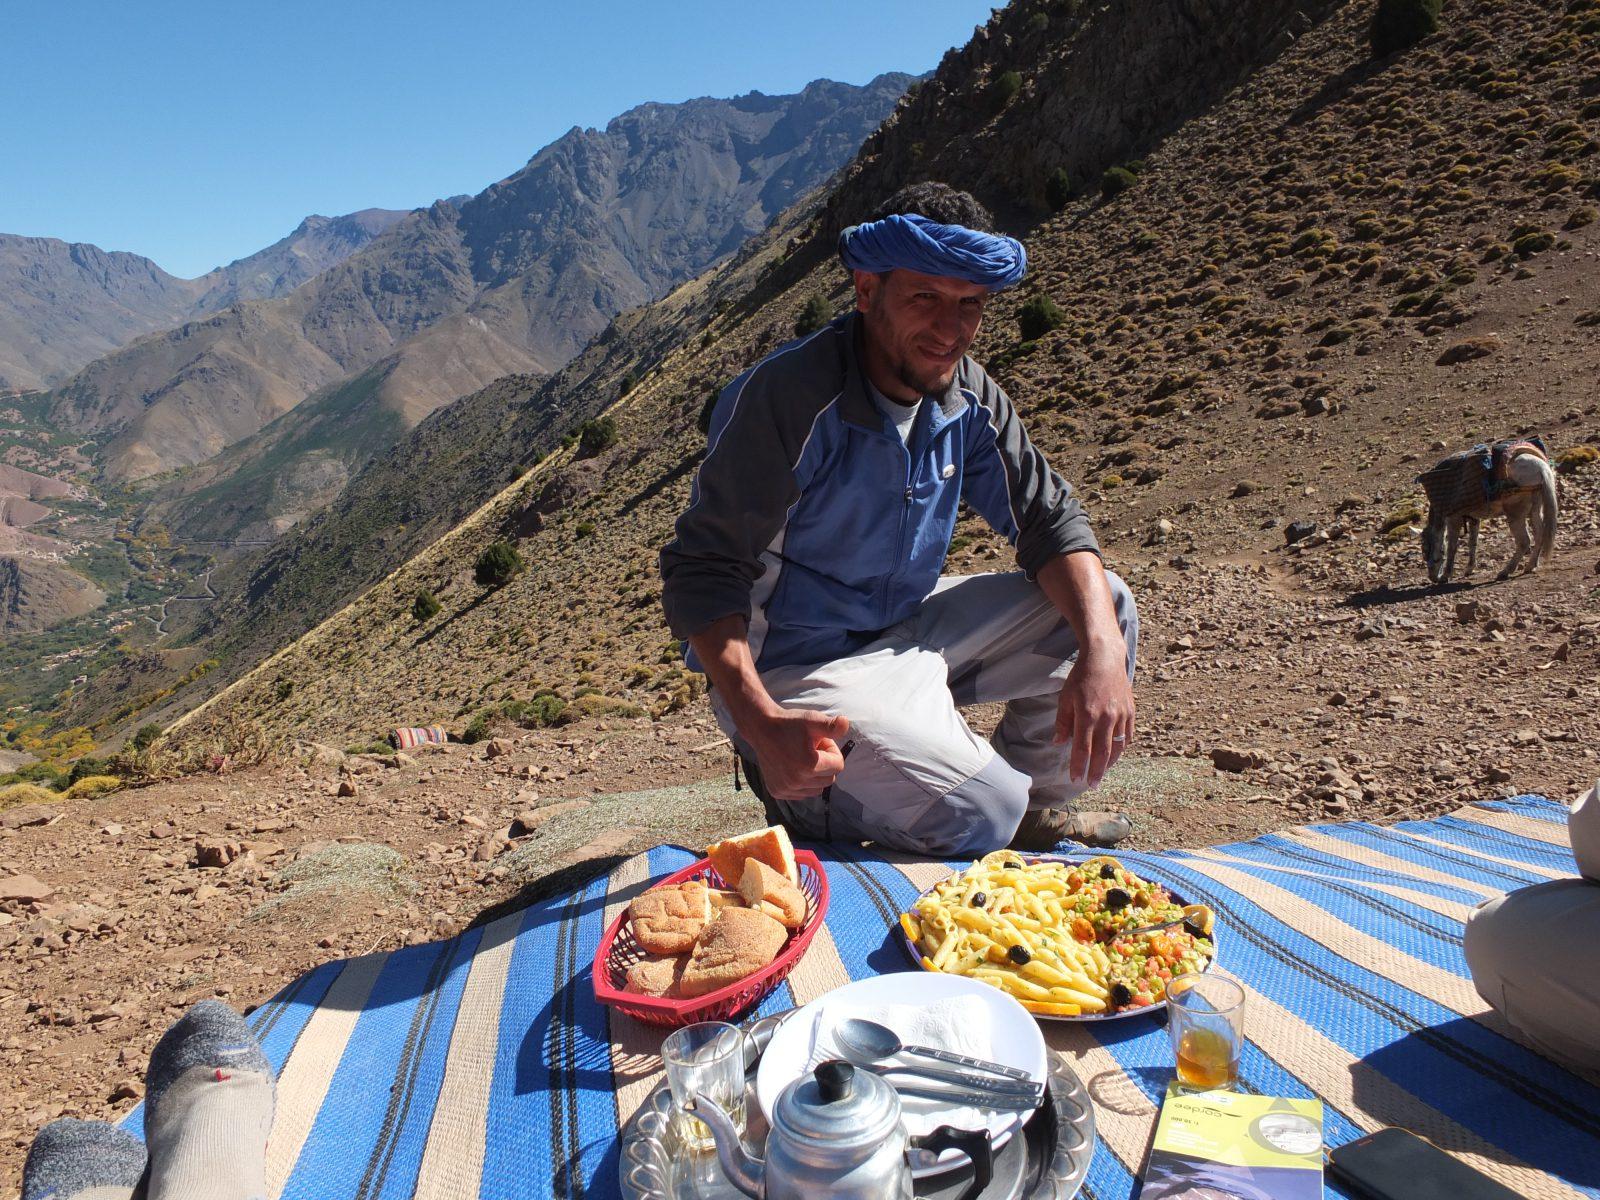 Dag 06 - Marokko Hoge Atlas wandelen 50+